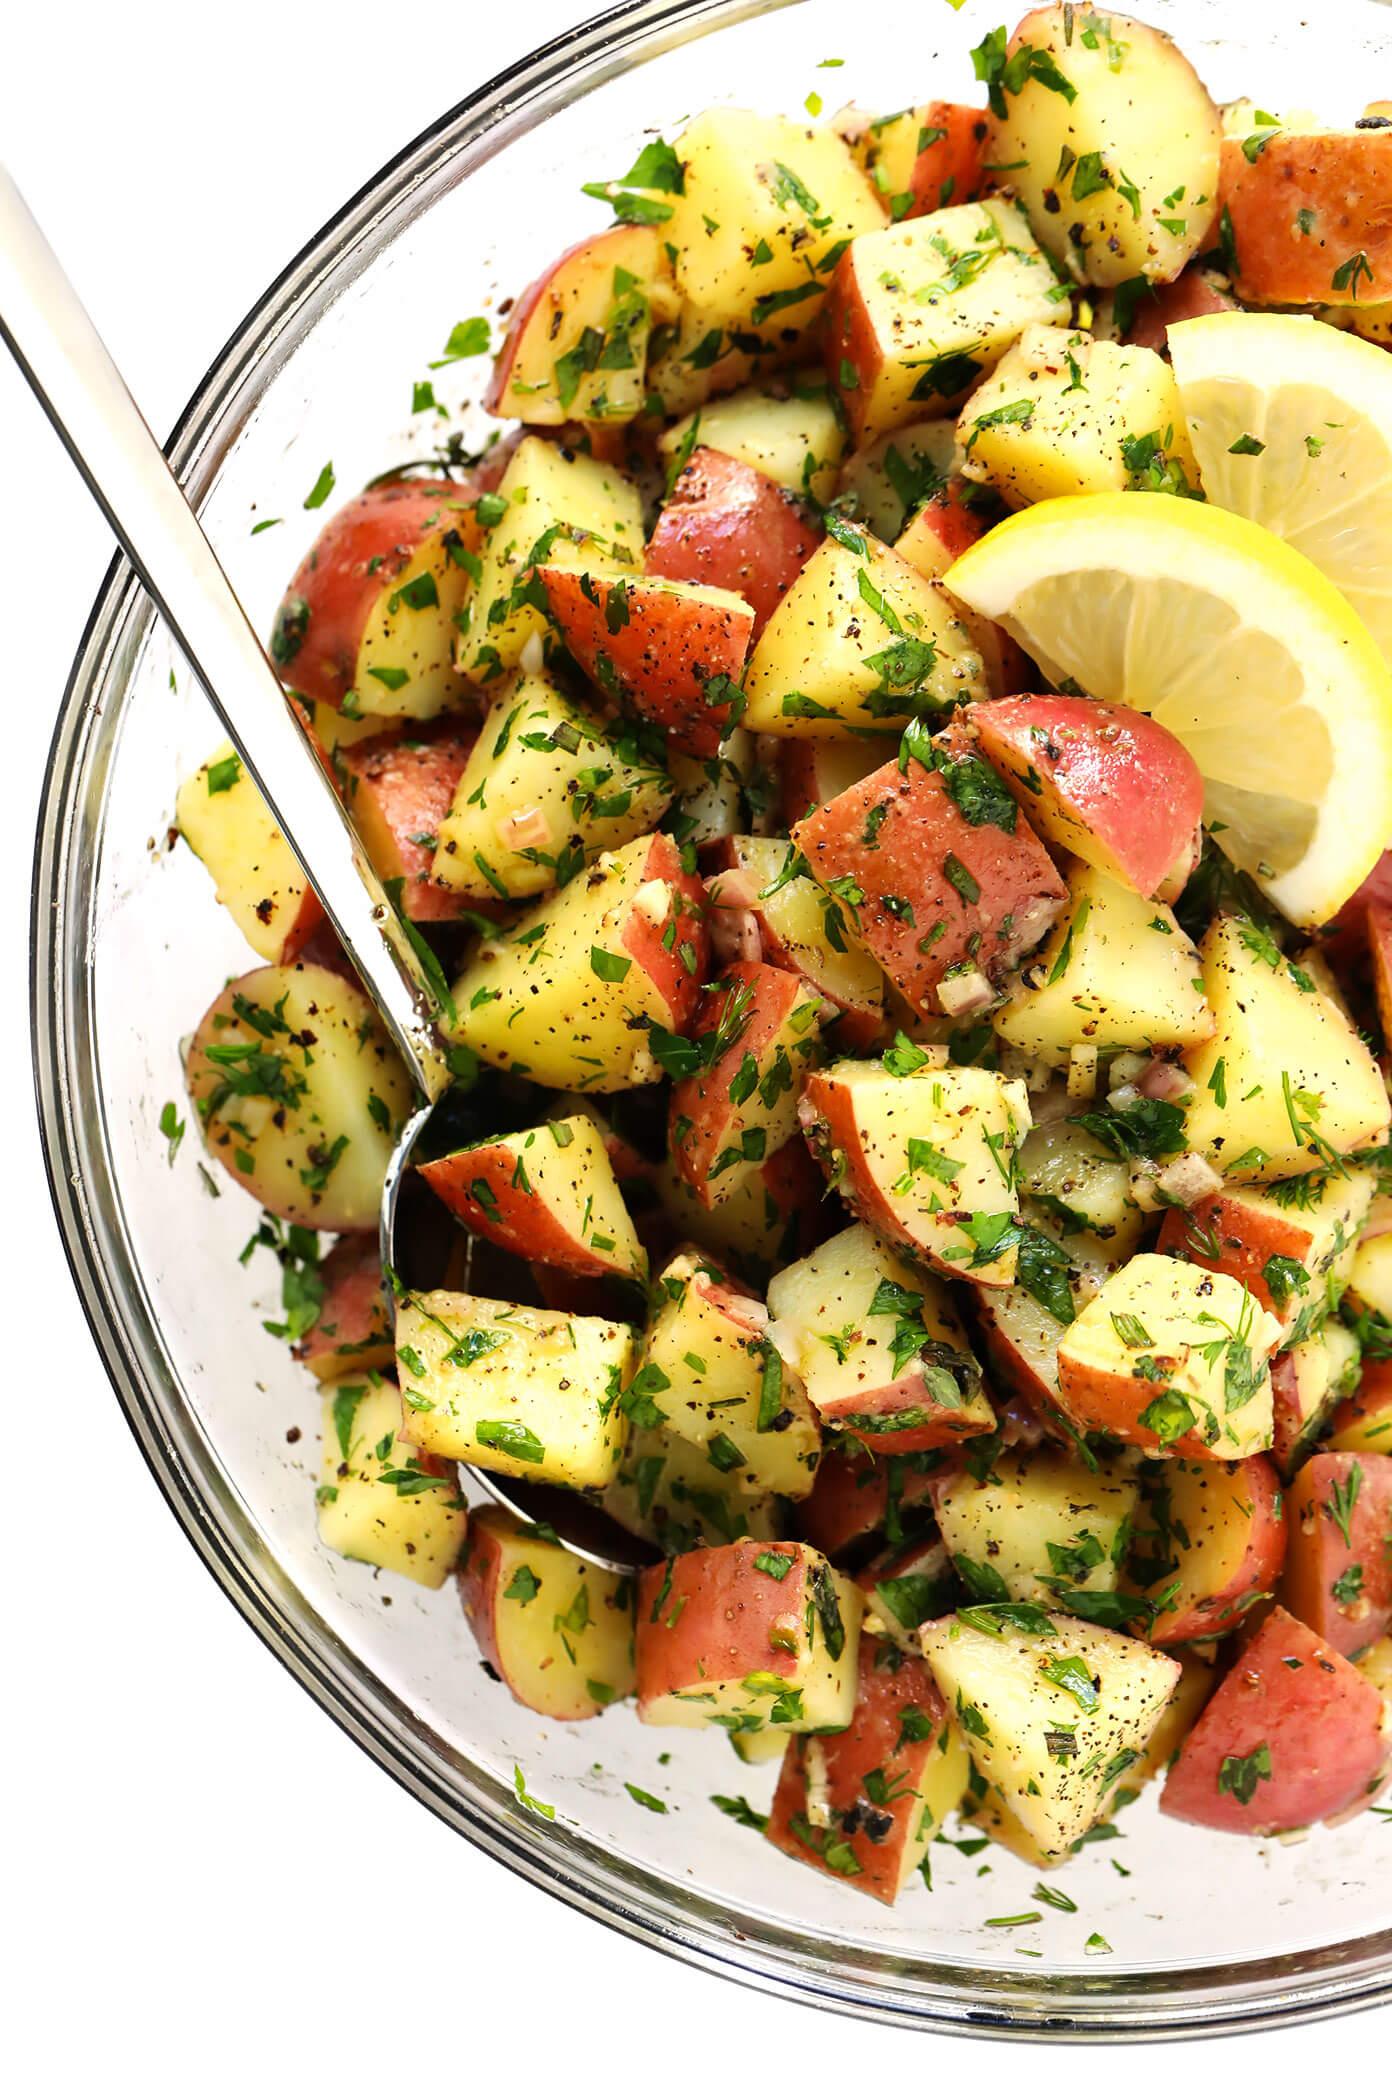 How To Make Potato Salad without Mayo